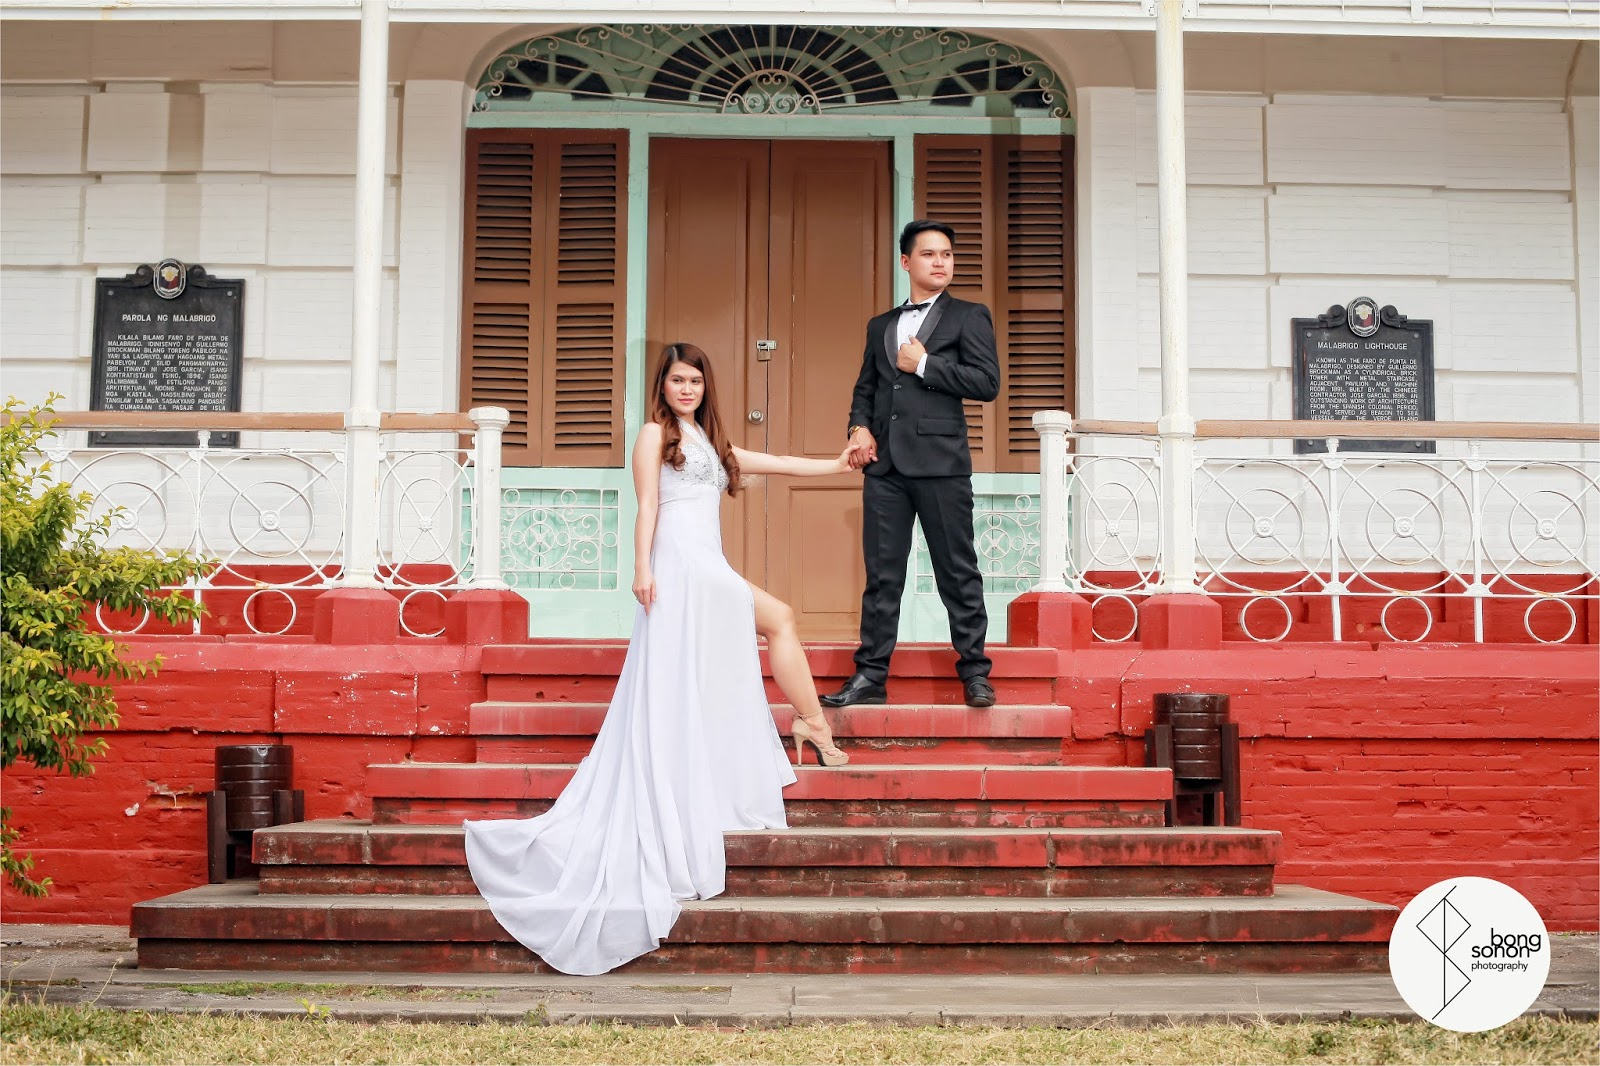 Sonon PHOTOGRAPHY Destinationwedding Batangaswedding Bongsononphotography Prenup Beachprenup Weddingsph Purephotographer Creativephotographer